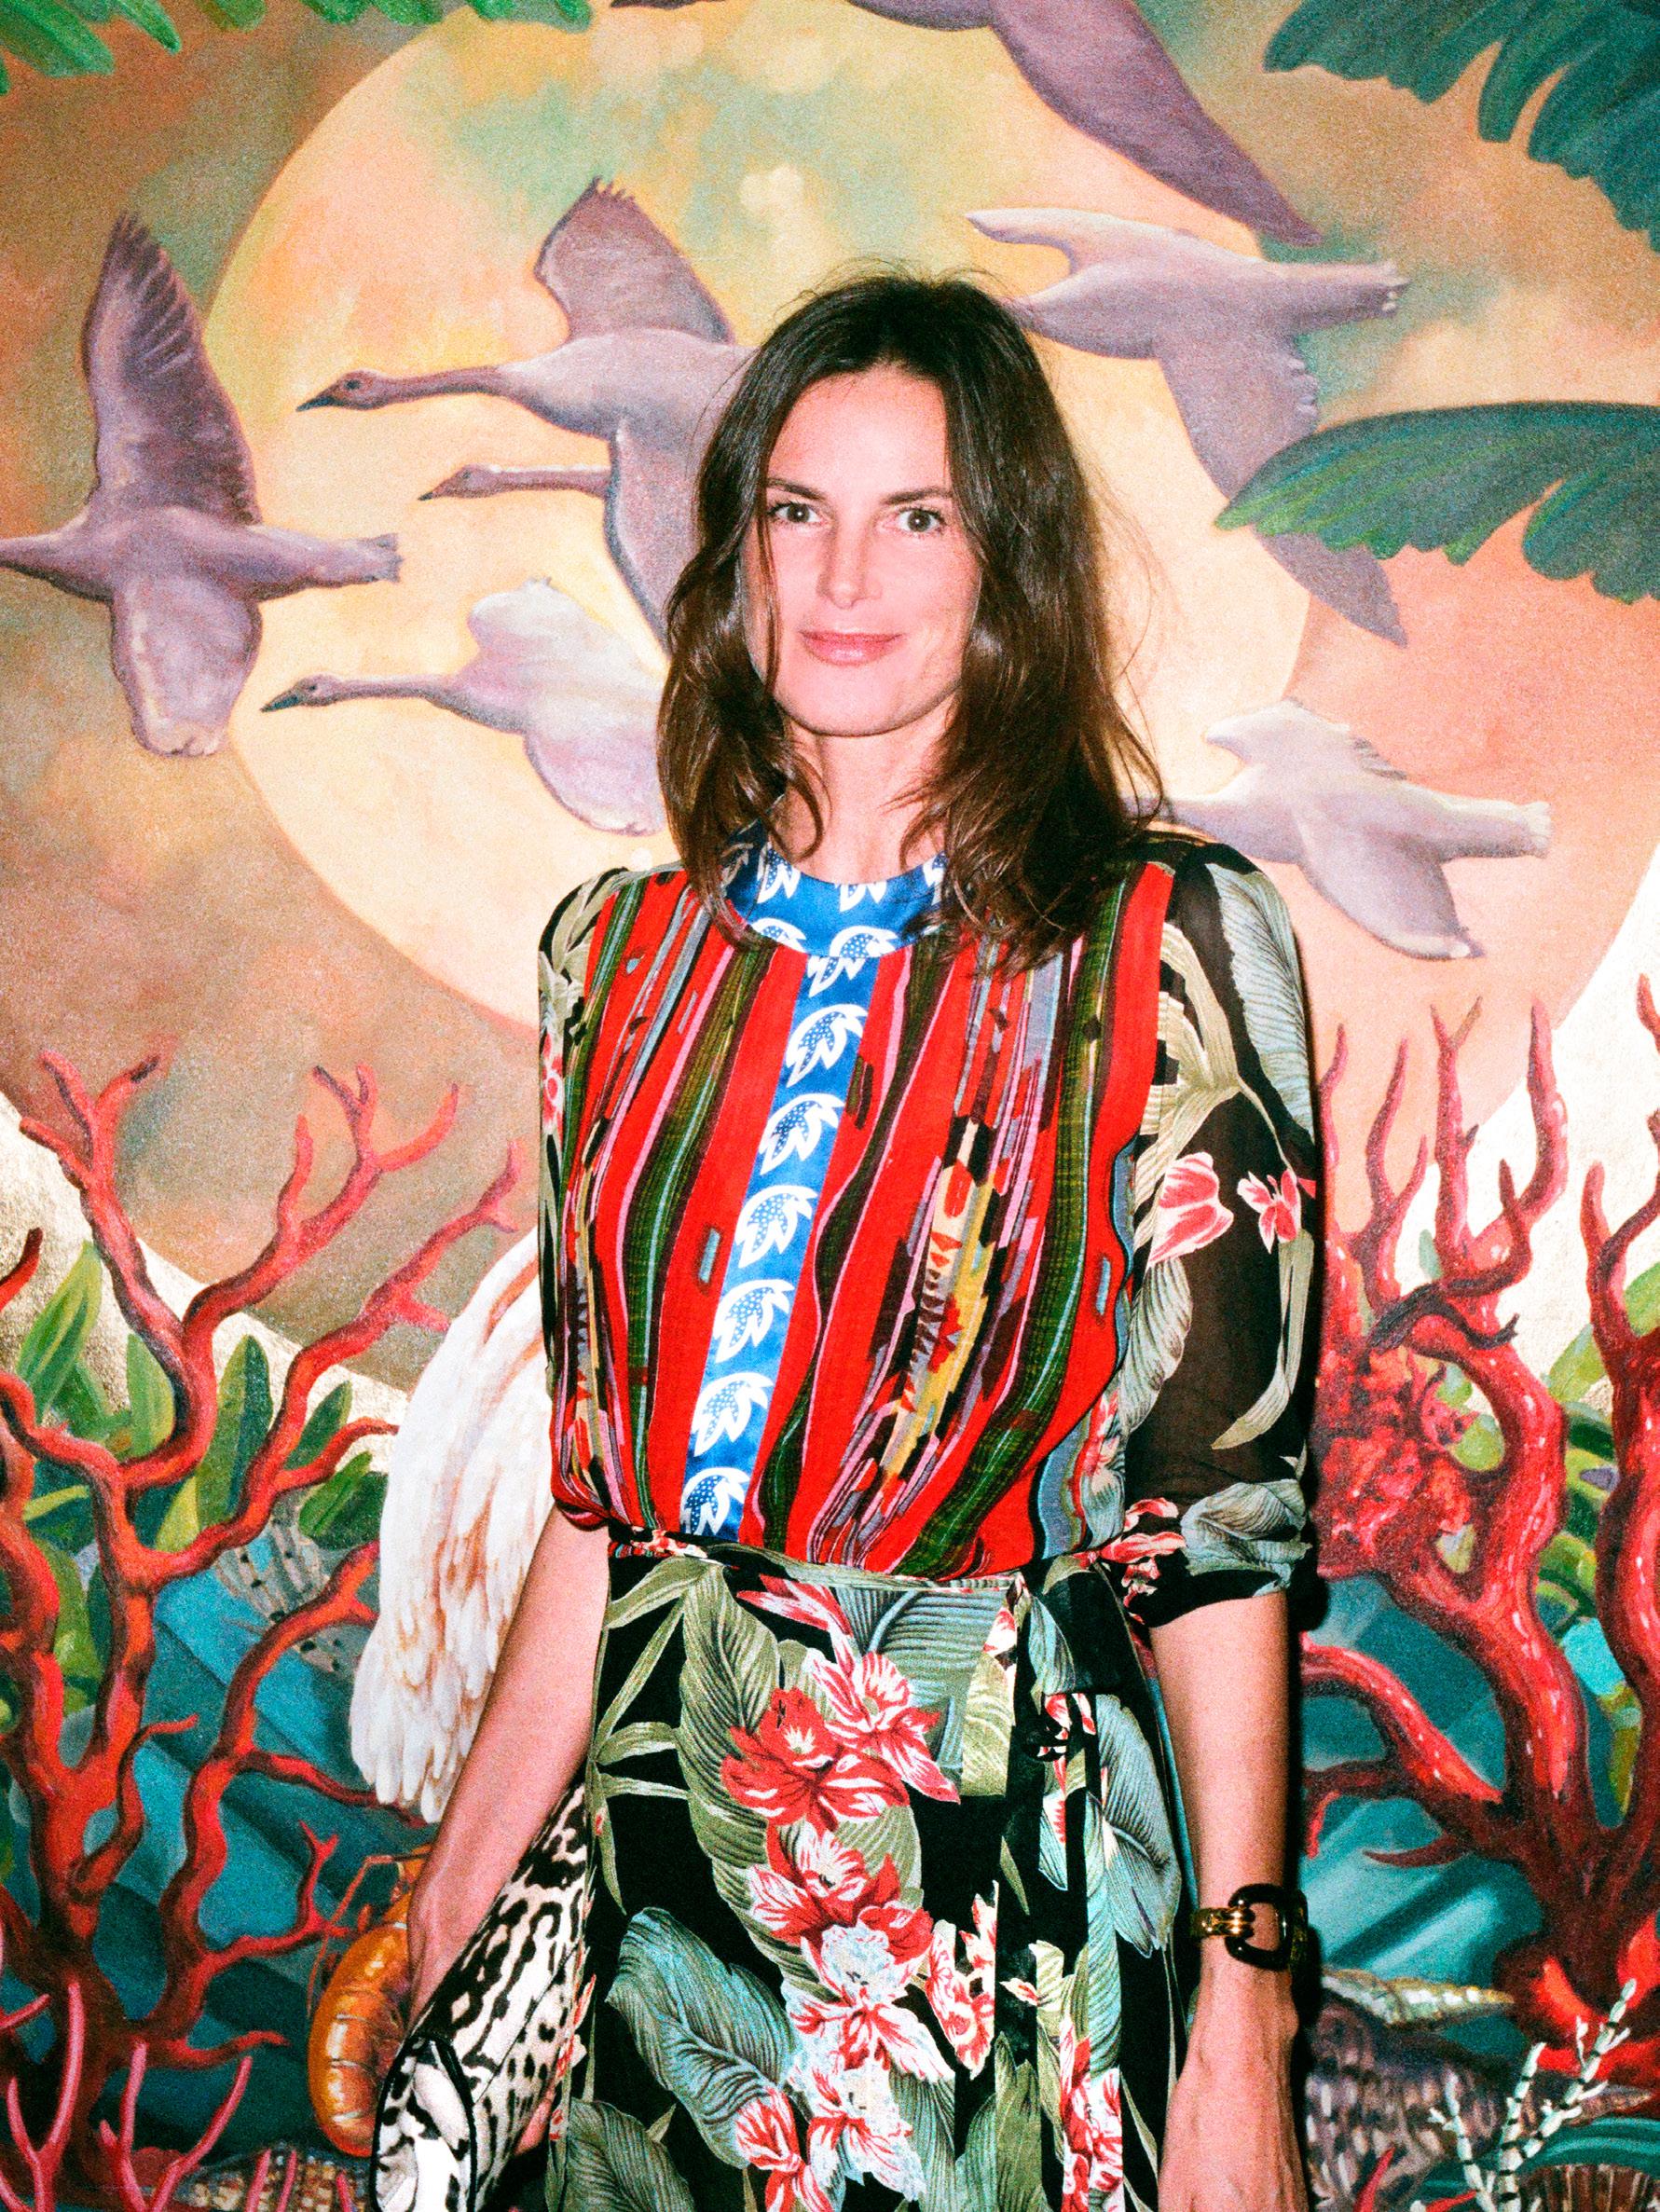 CLAUDIA DONALDSON  frente a uno de los murales de  JUAN GATTI